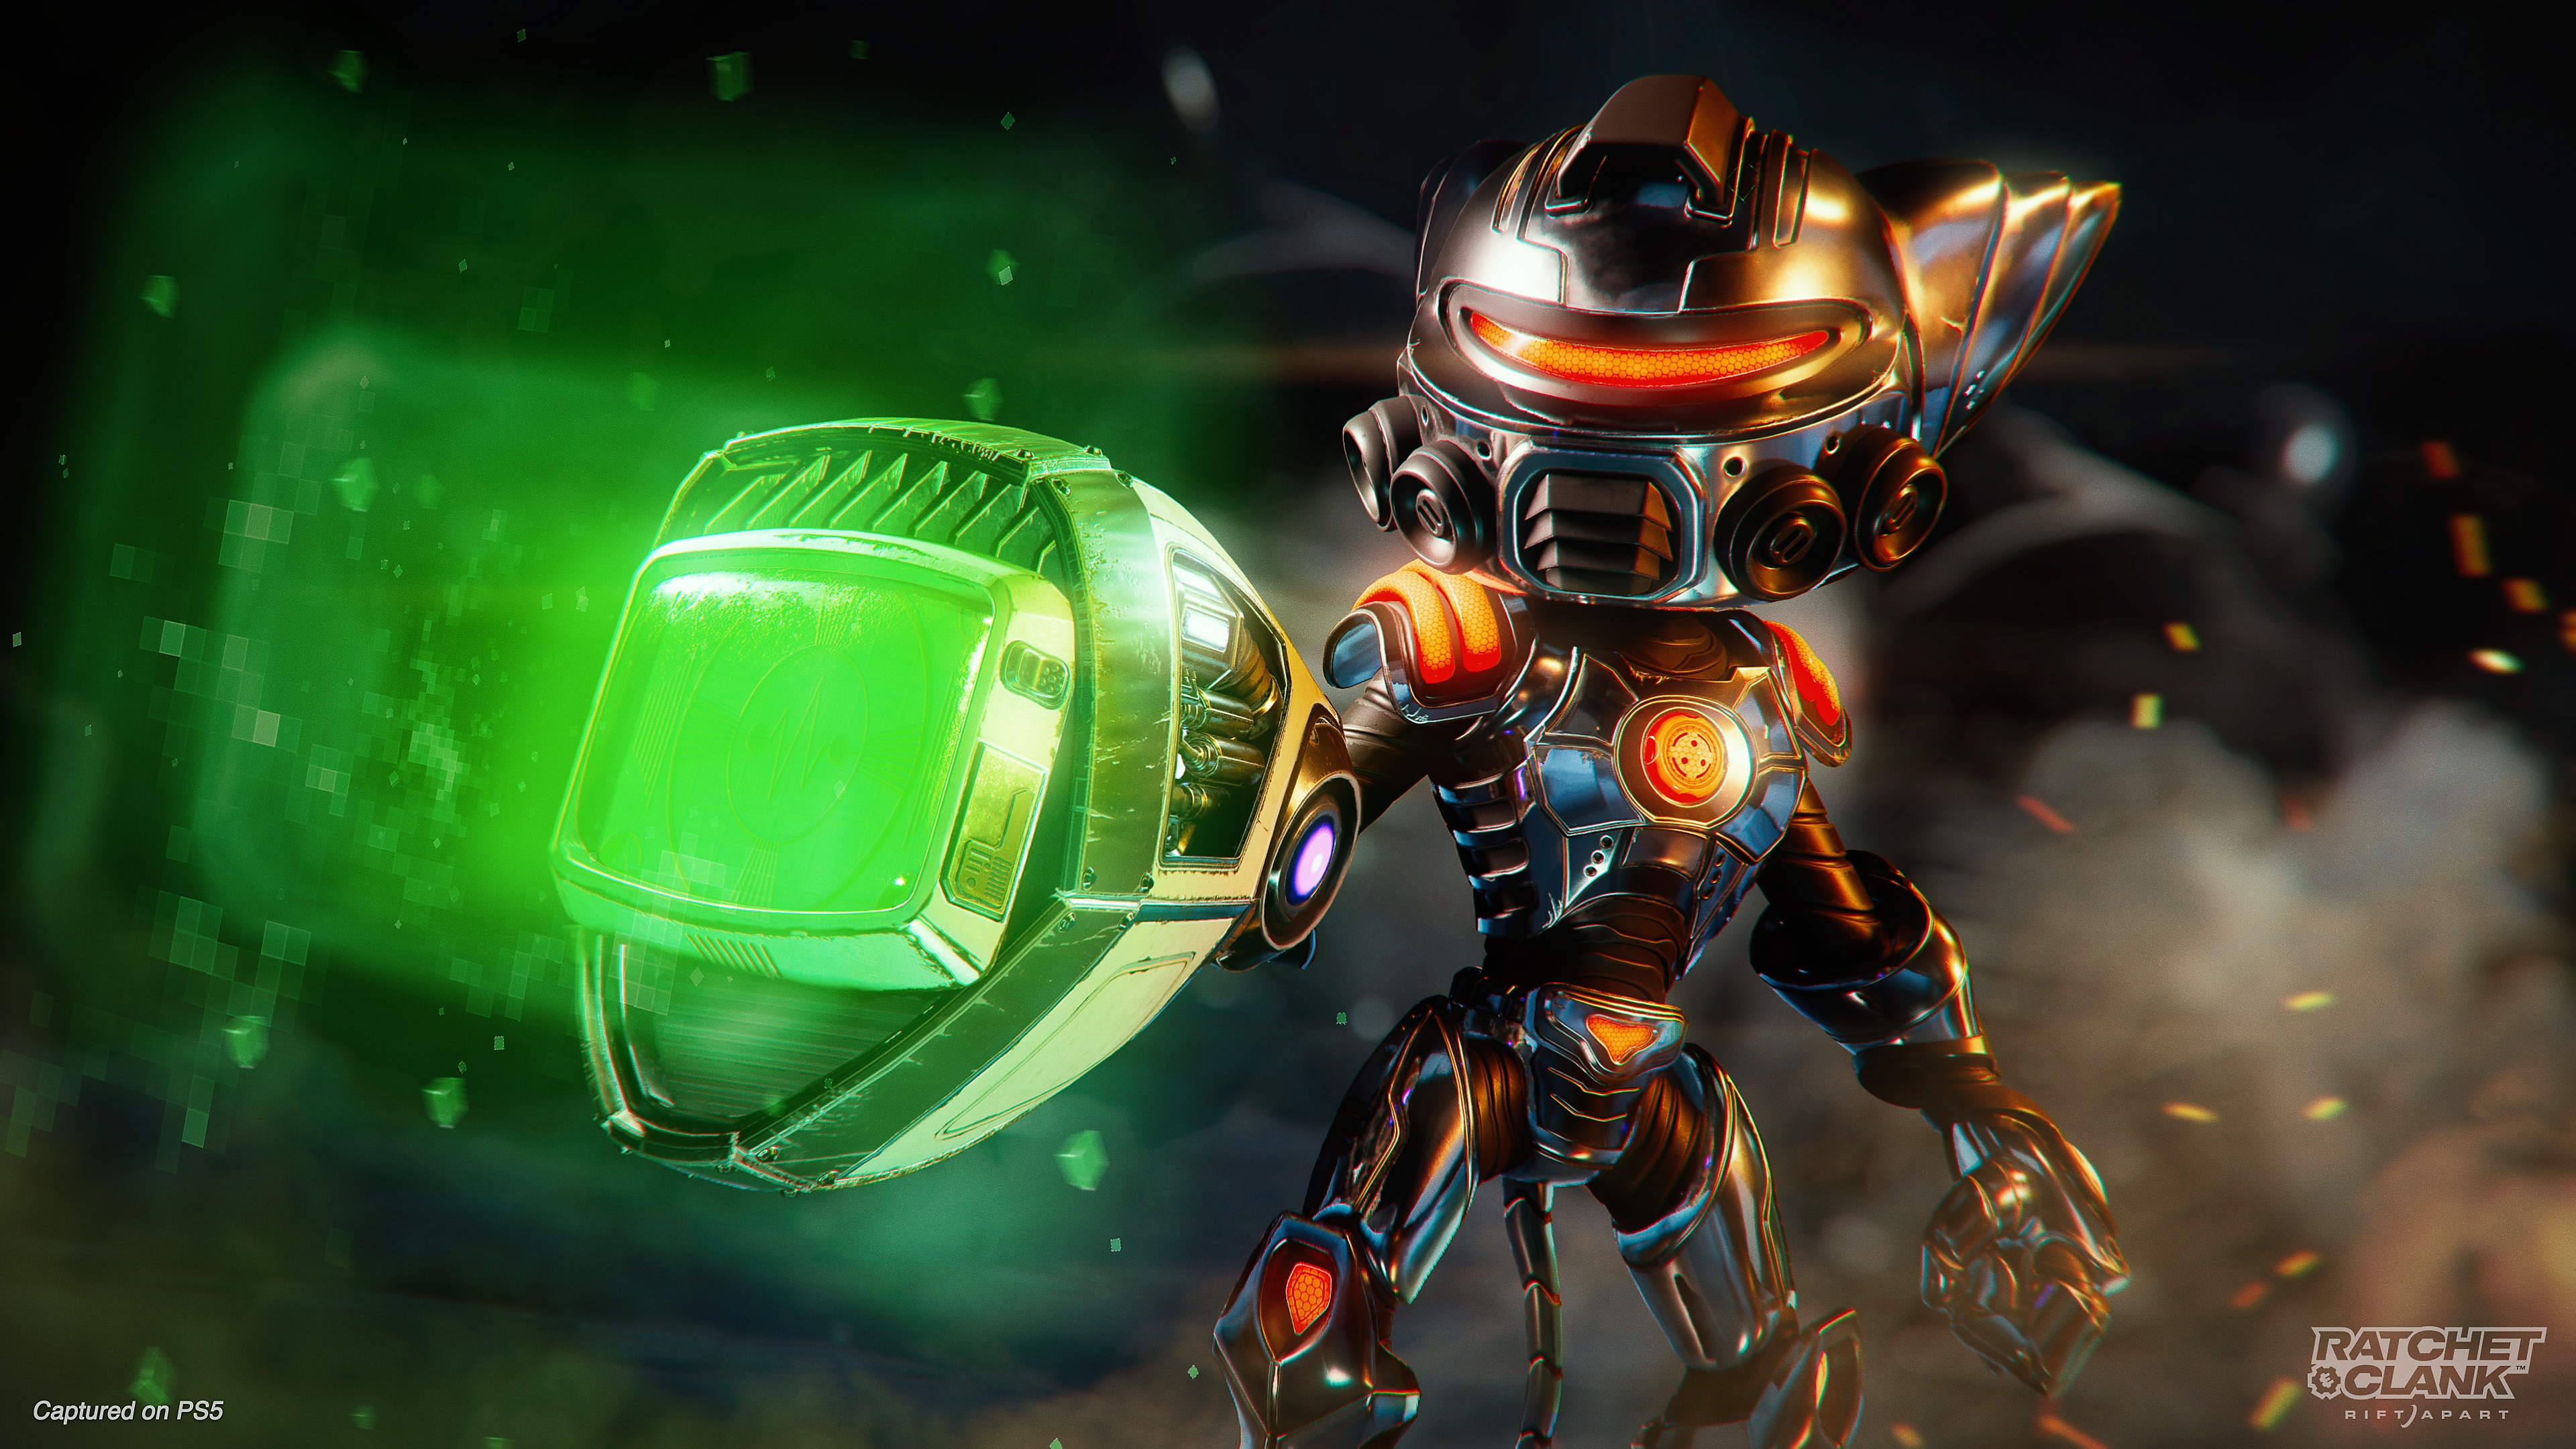 Ratchet and Clank - zbroj